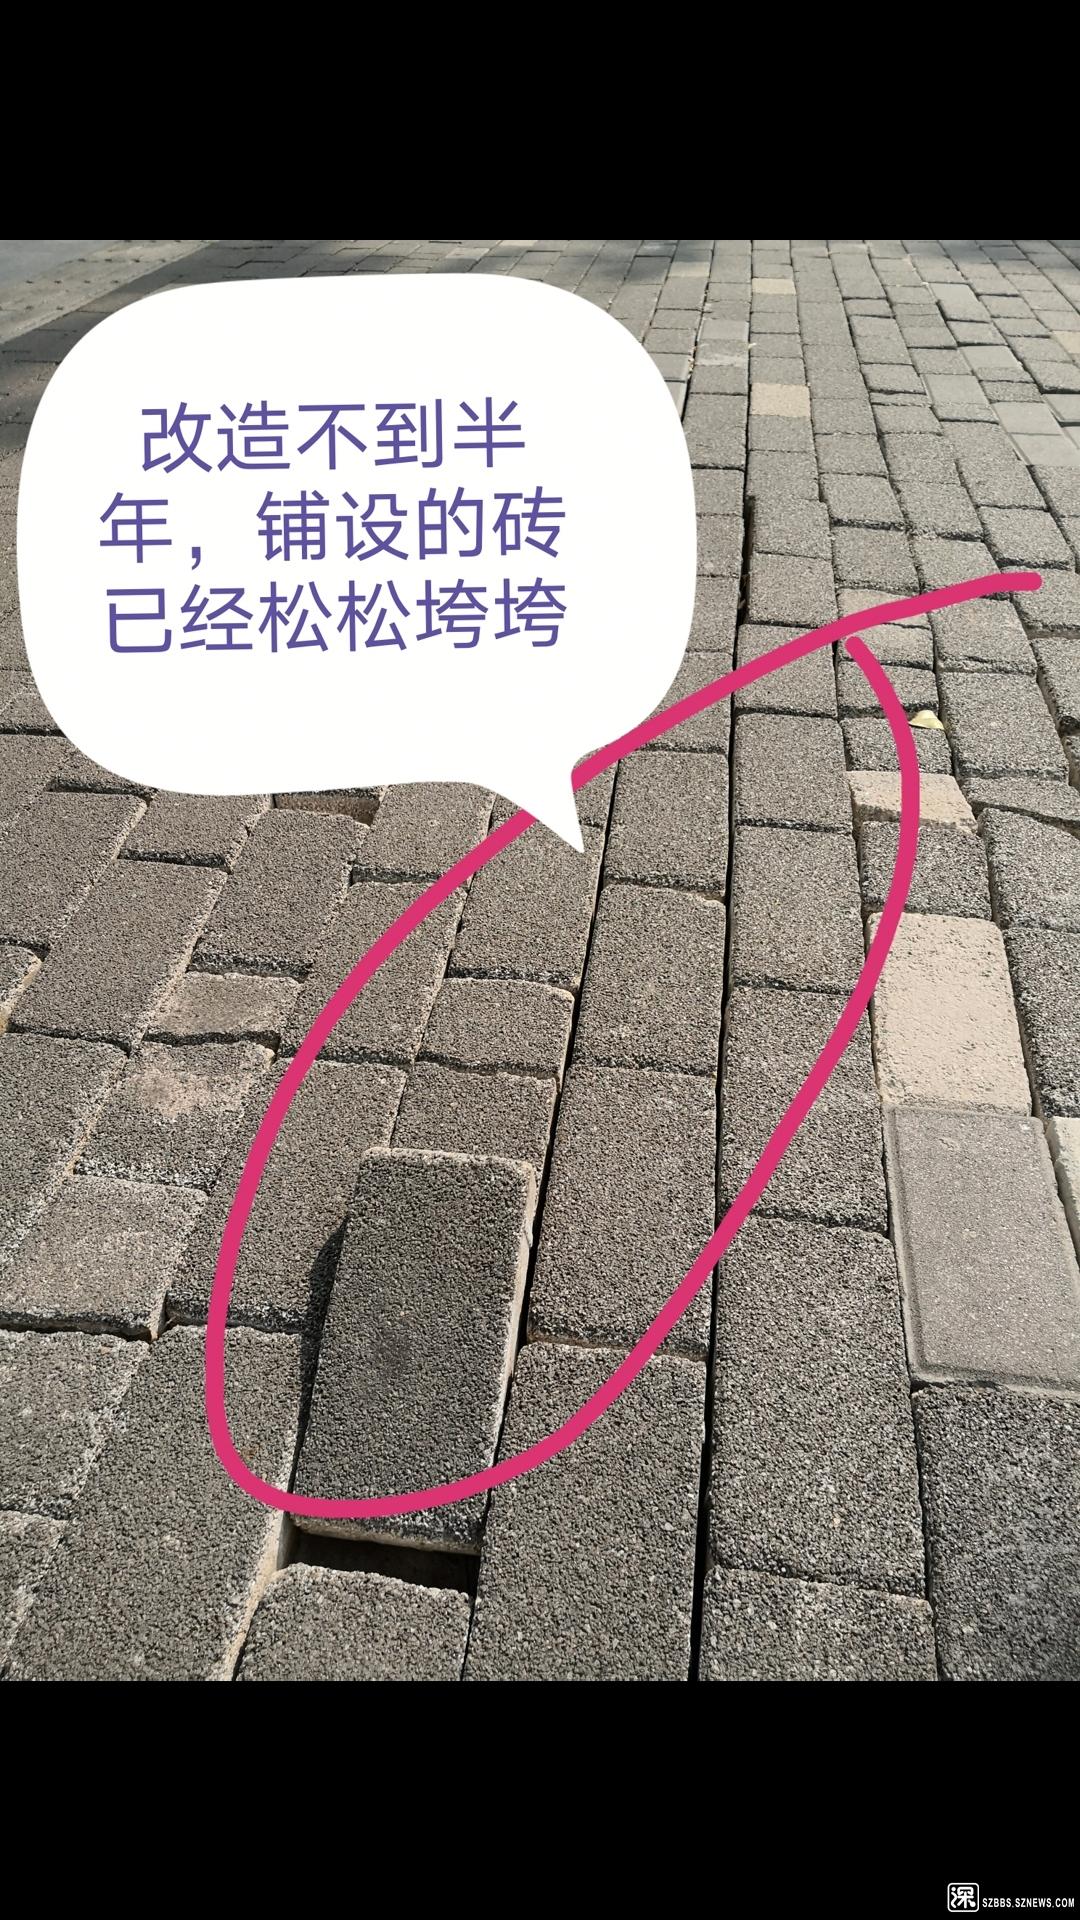 Screenshot_20200315_162935_com.android.gallery3d.jpg